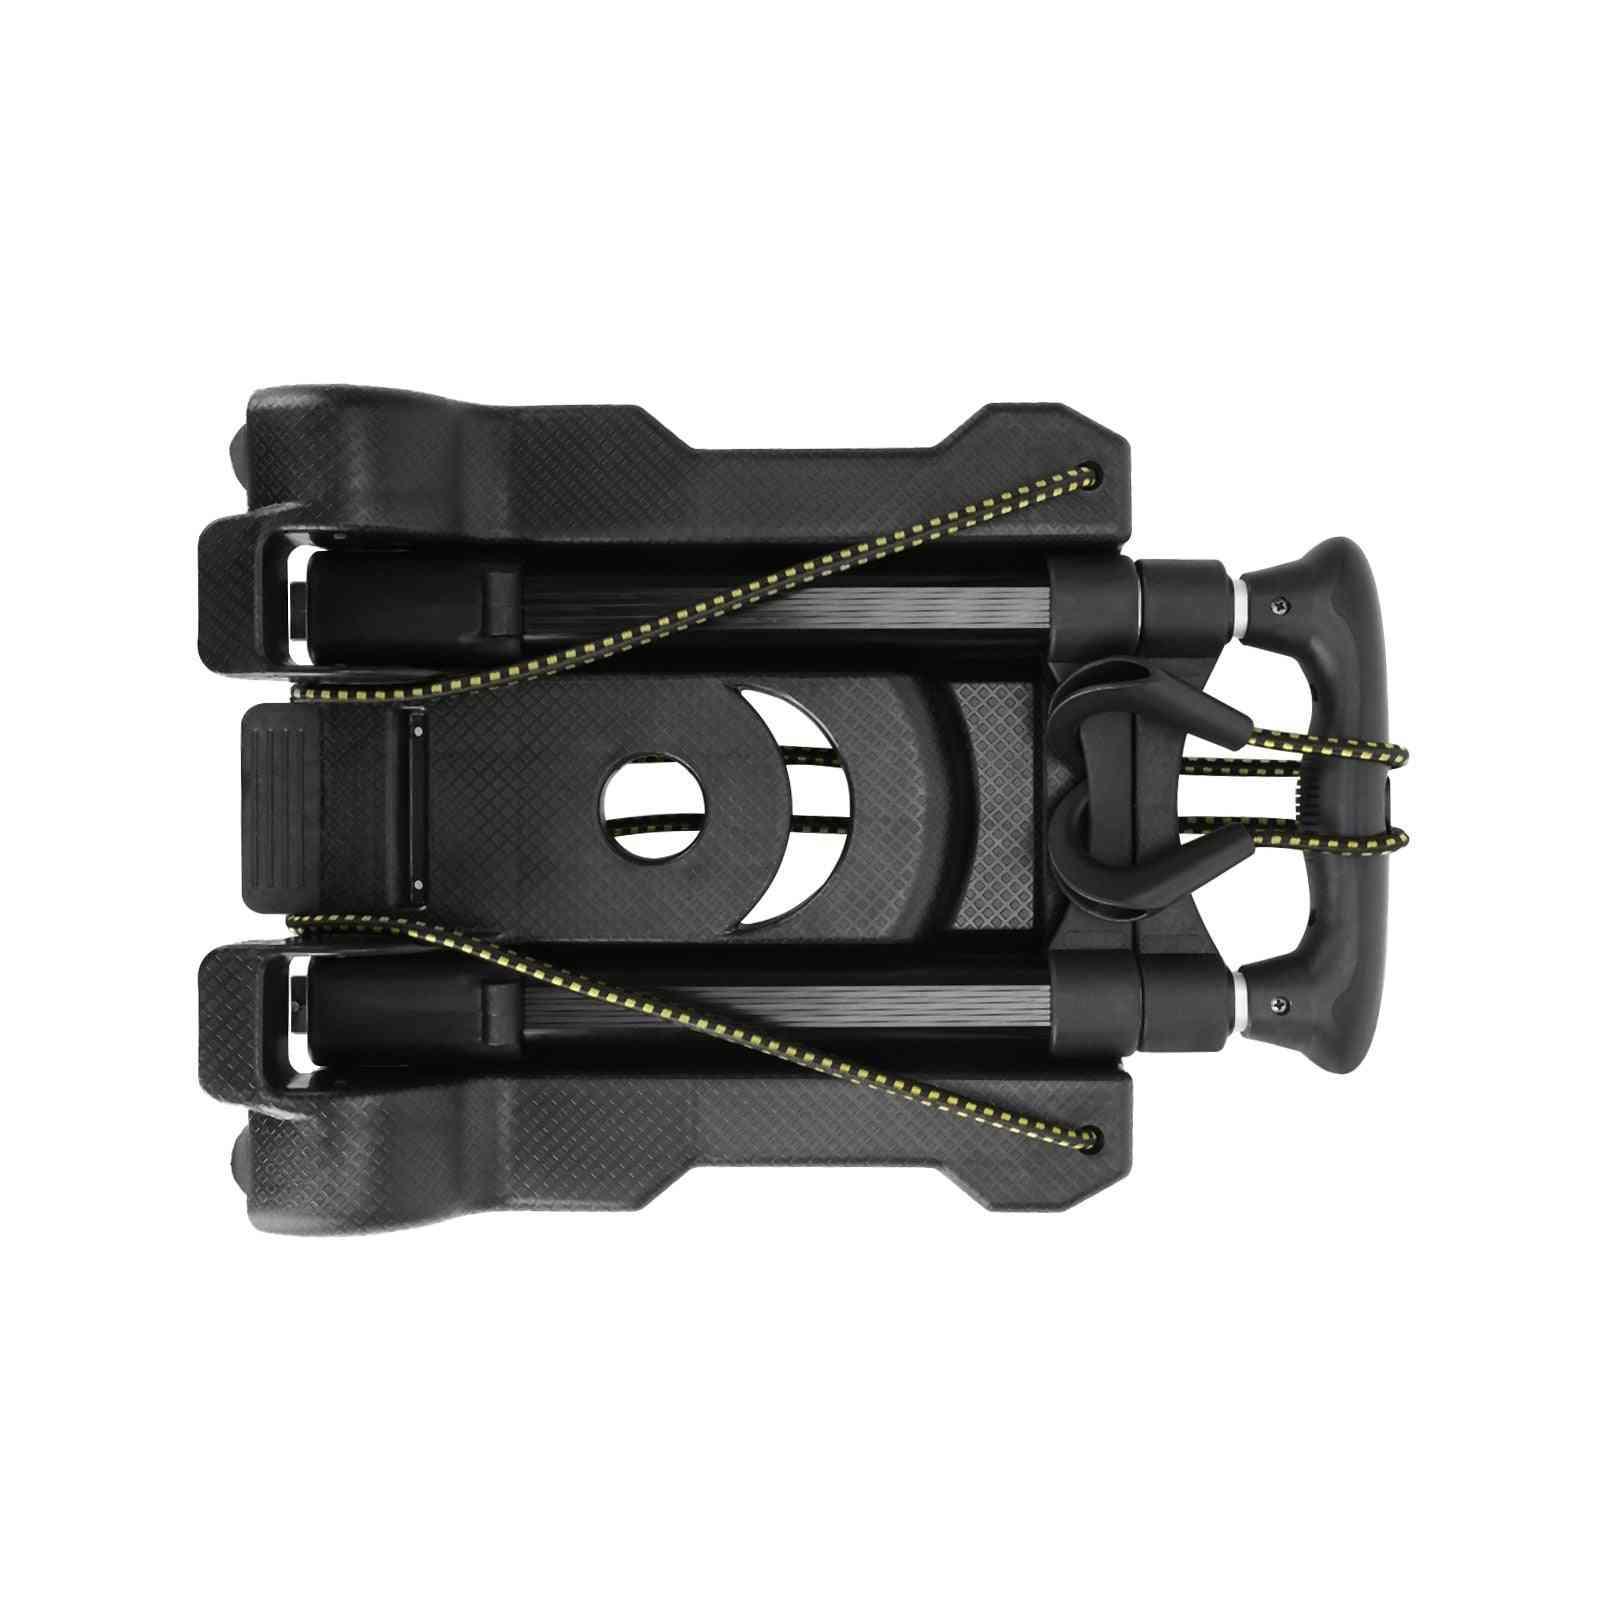 Garden Cart Foldable Aluminum Alloy Trolley, Travel Luggage Cart